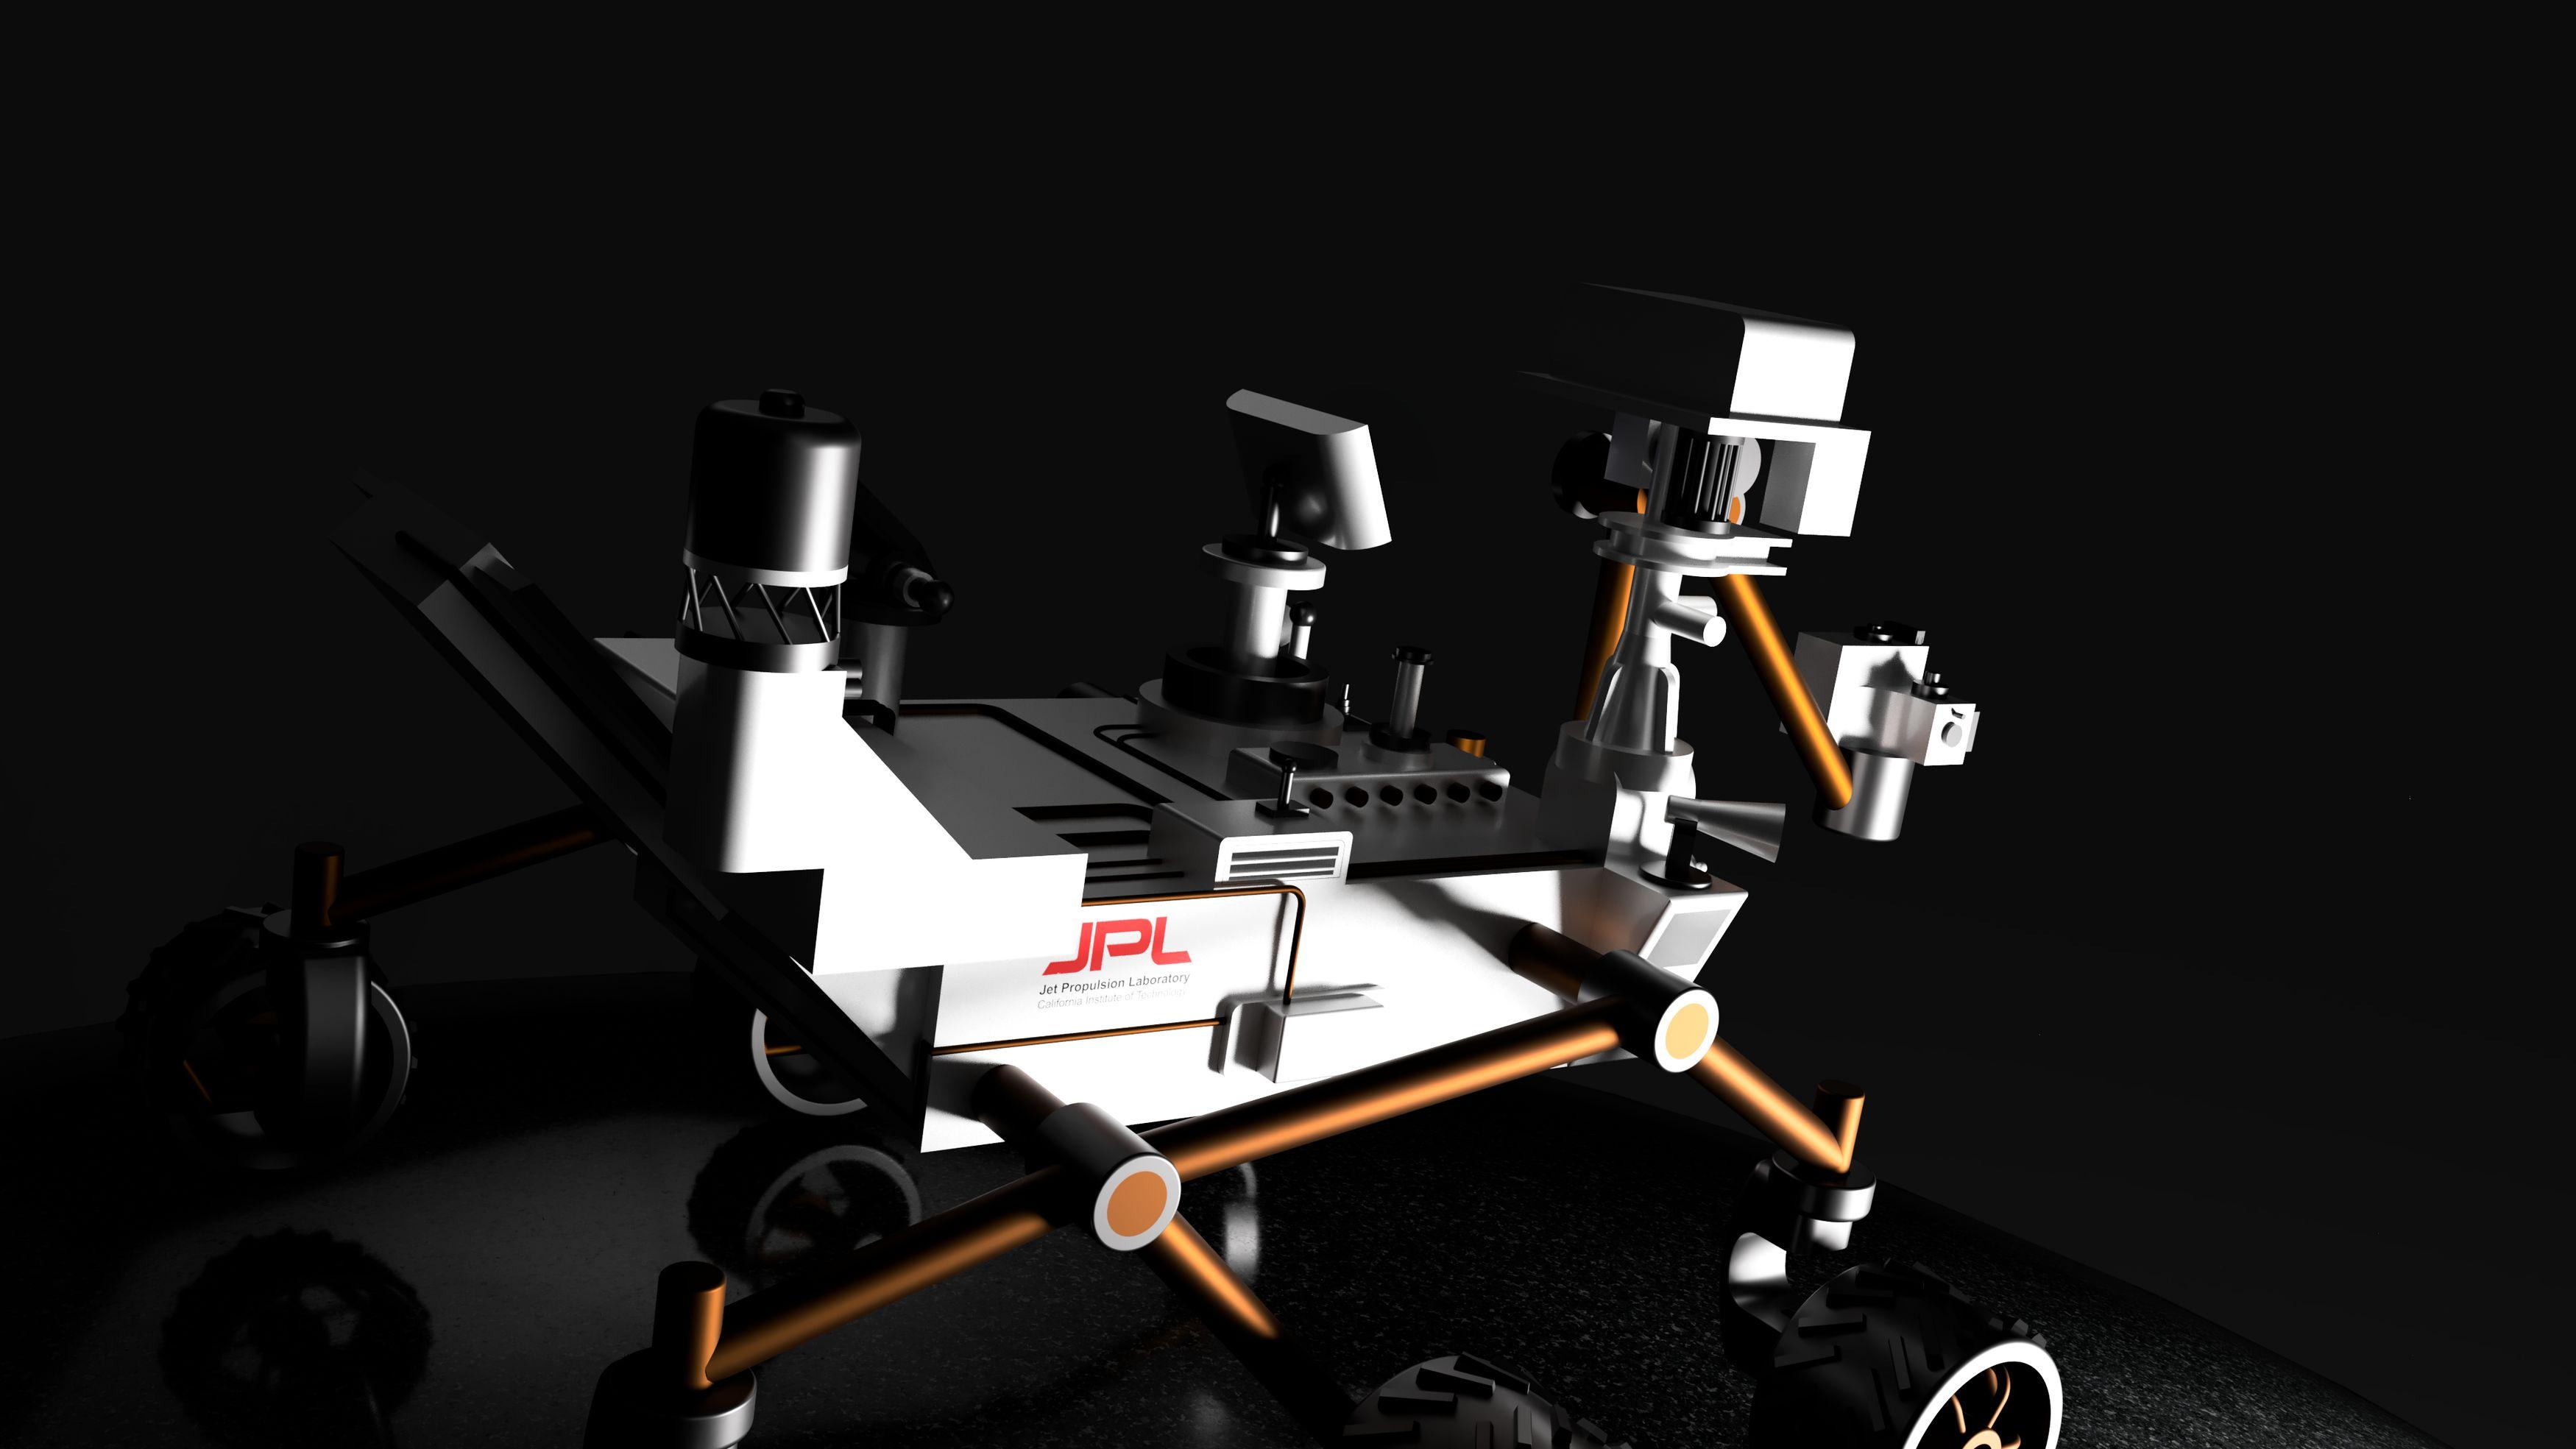 Robot-space-nasa---lcs2020-2020-may-06-10-50-27pm-000-customizedview28054726291-png-3500-3500